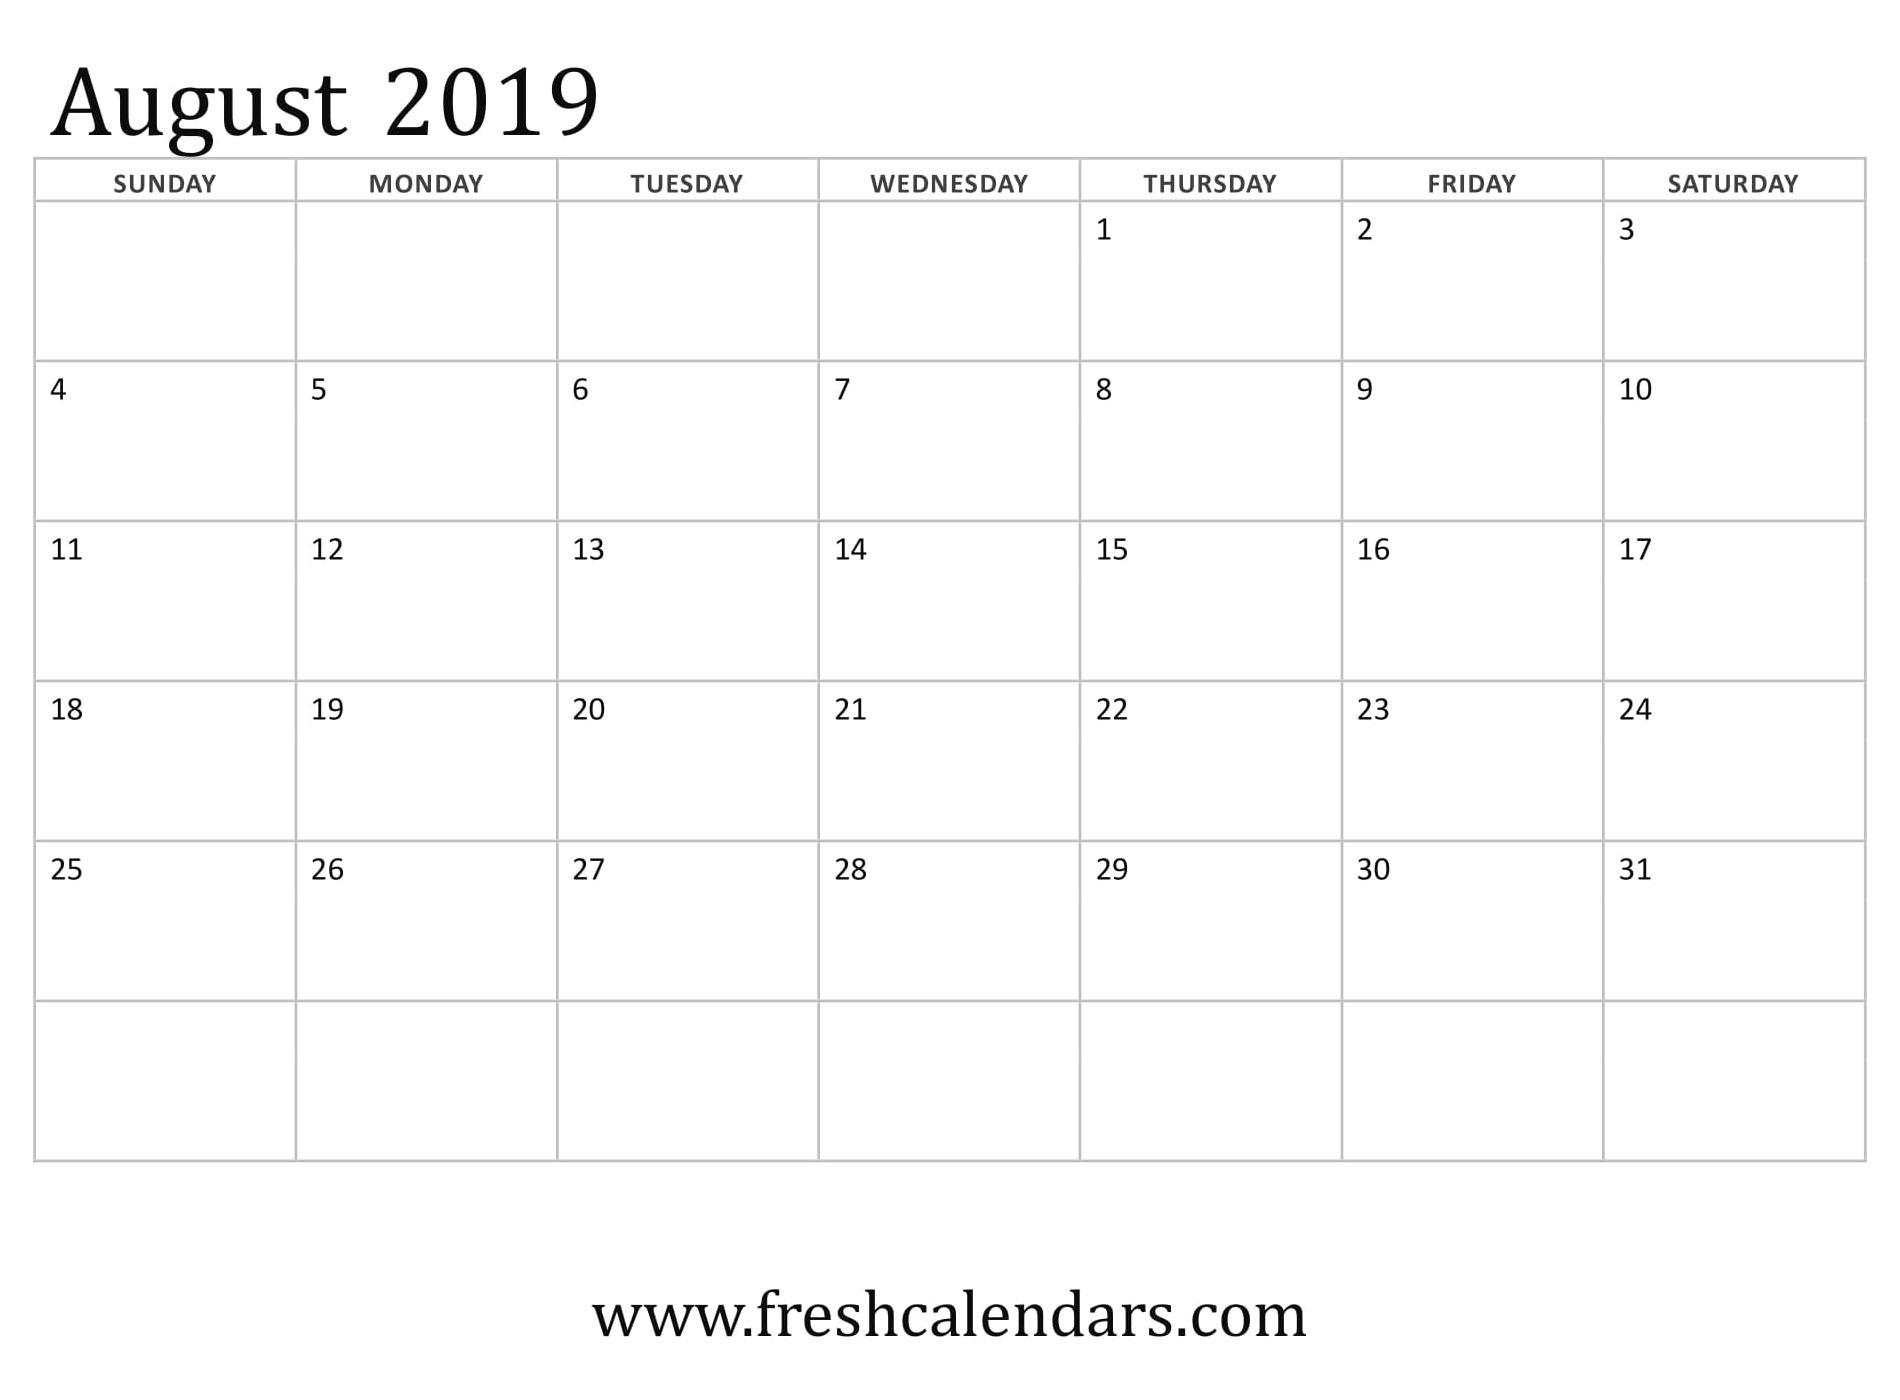 Catch August 2019 Monthly Monday Through Friday Calendar